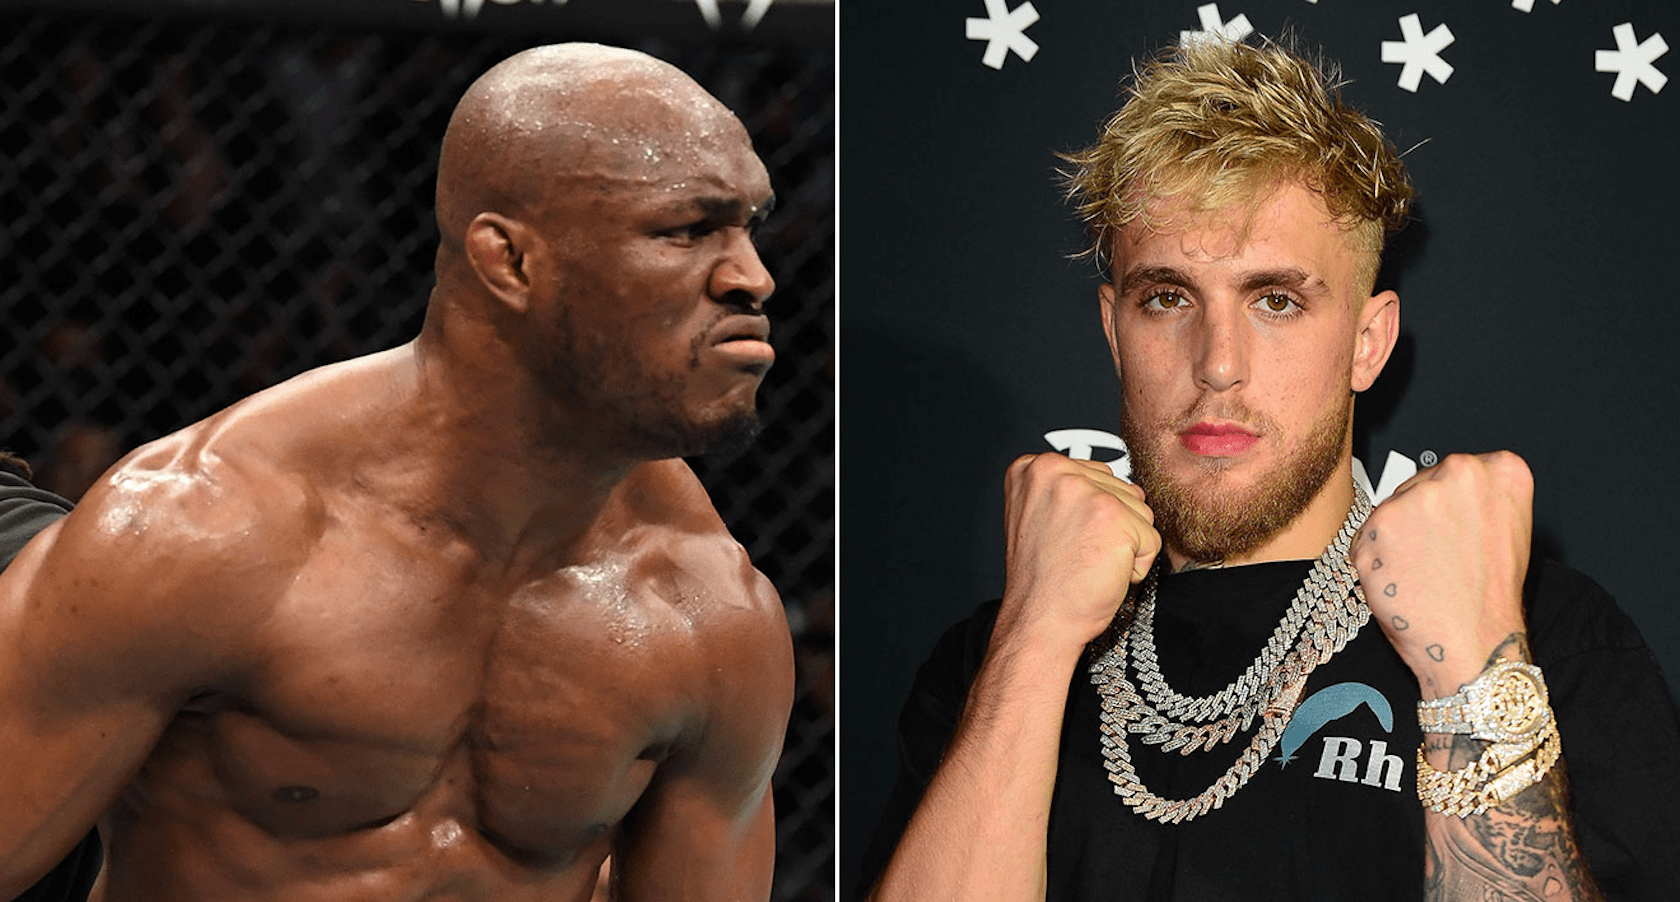 Kamaru Usman Wants At Least $100 Million To Fight Jake Paul